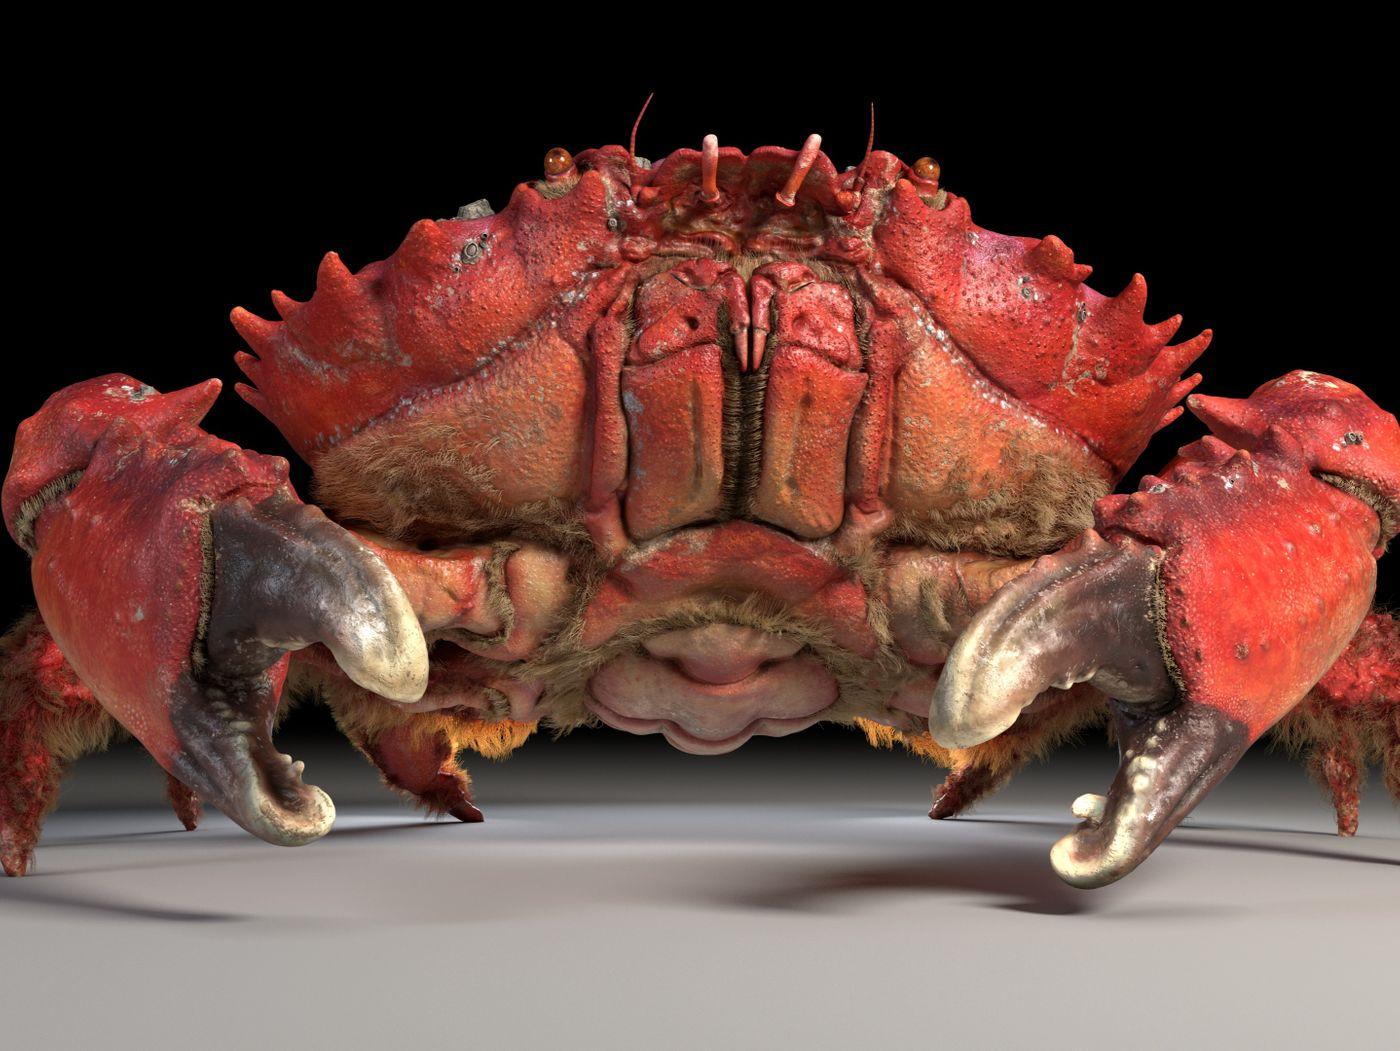 Spiny Spooner Crab